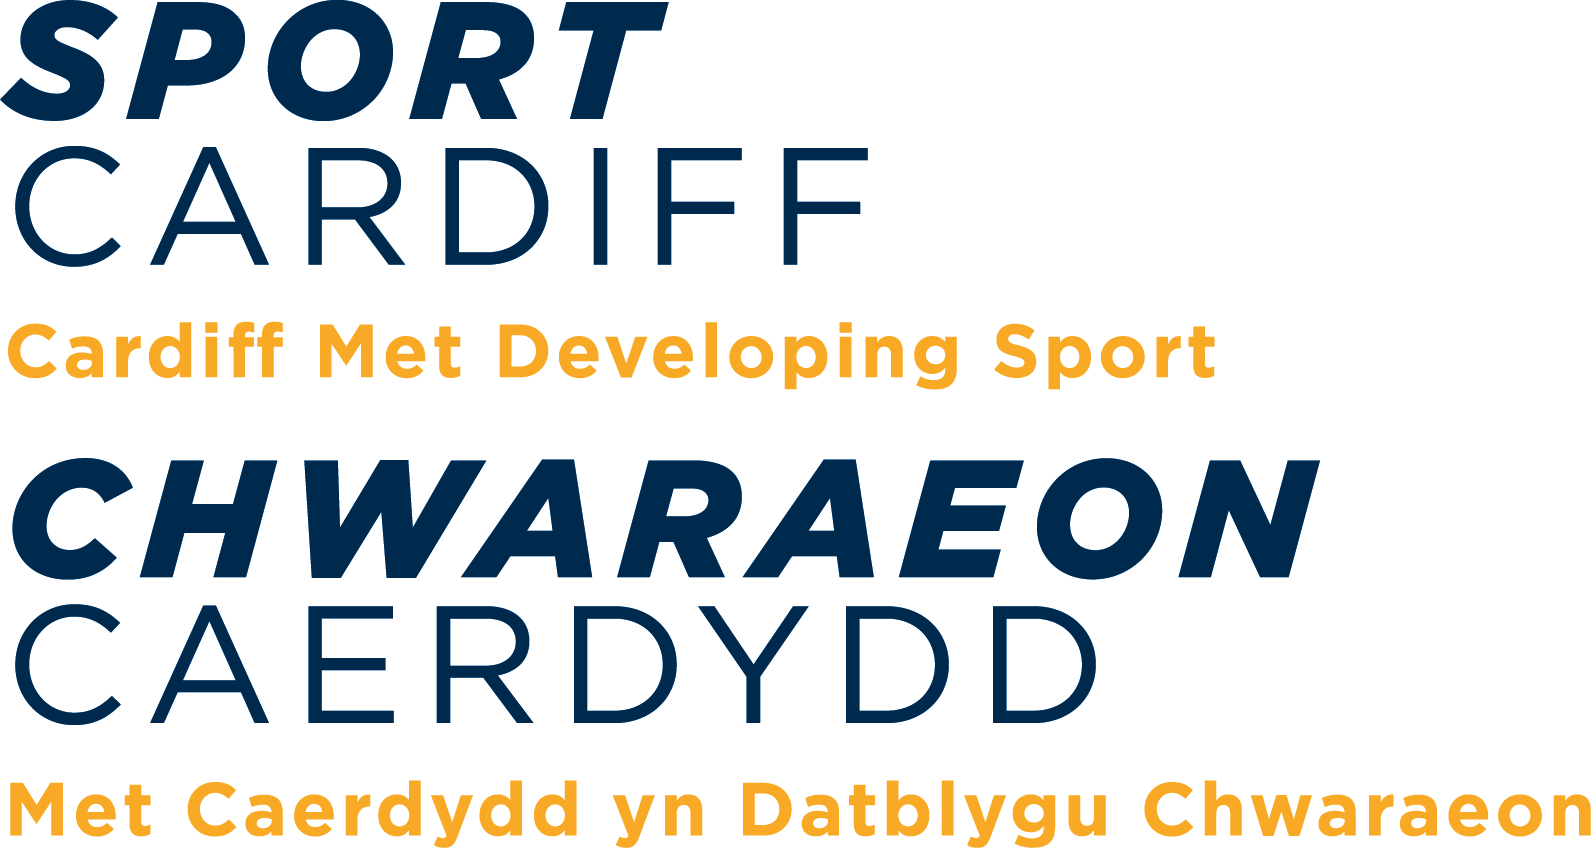 Sport Cardiff